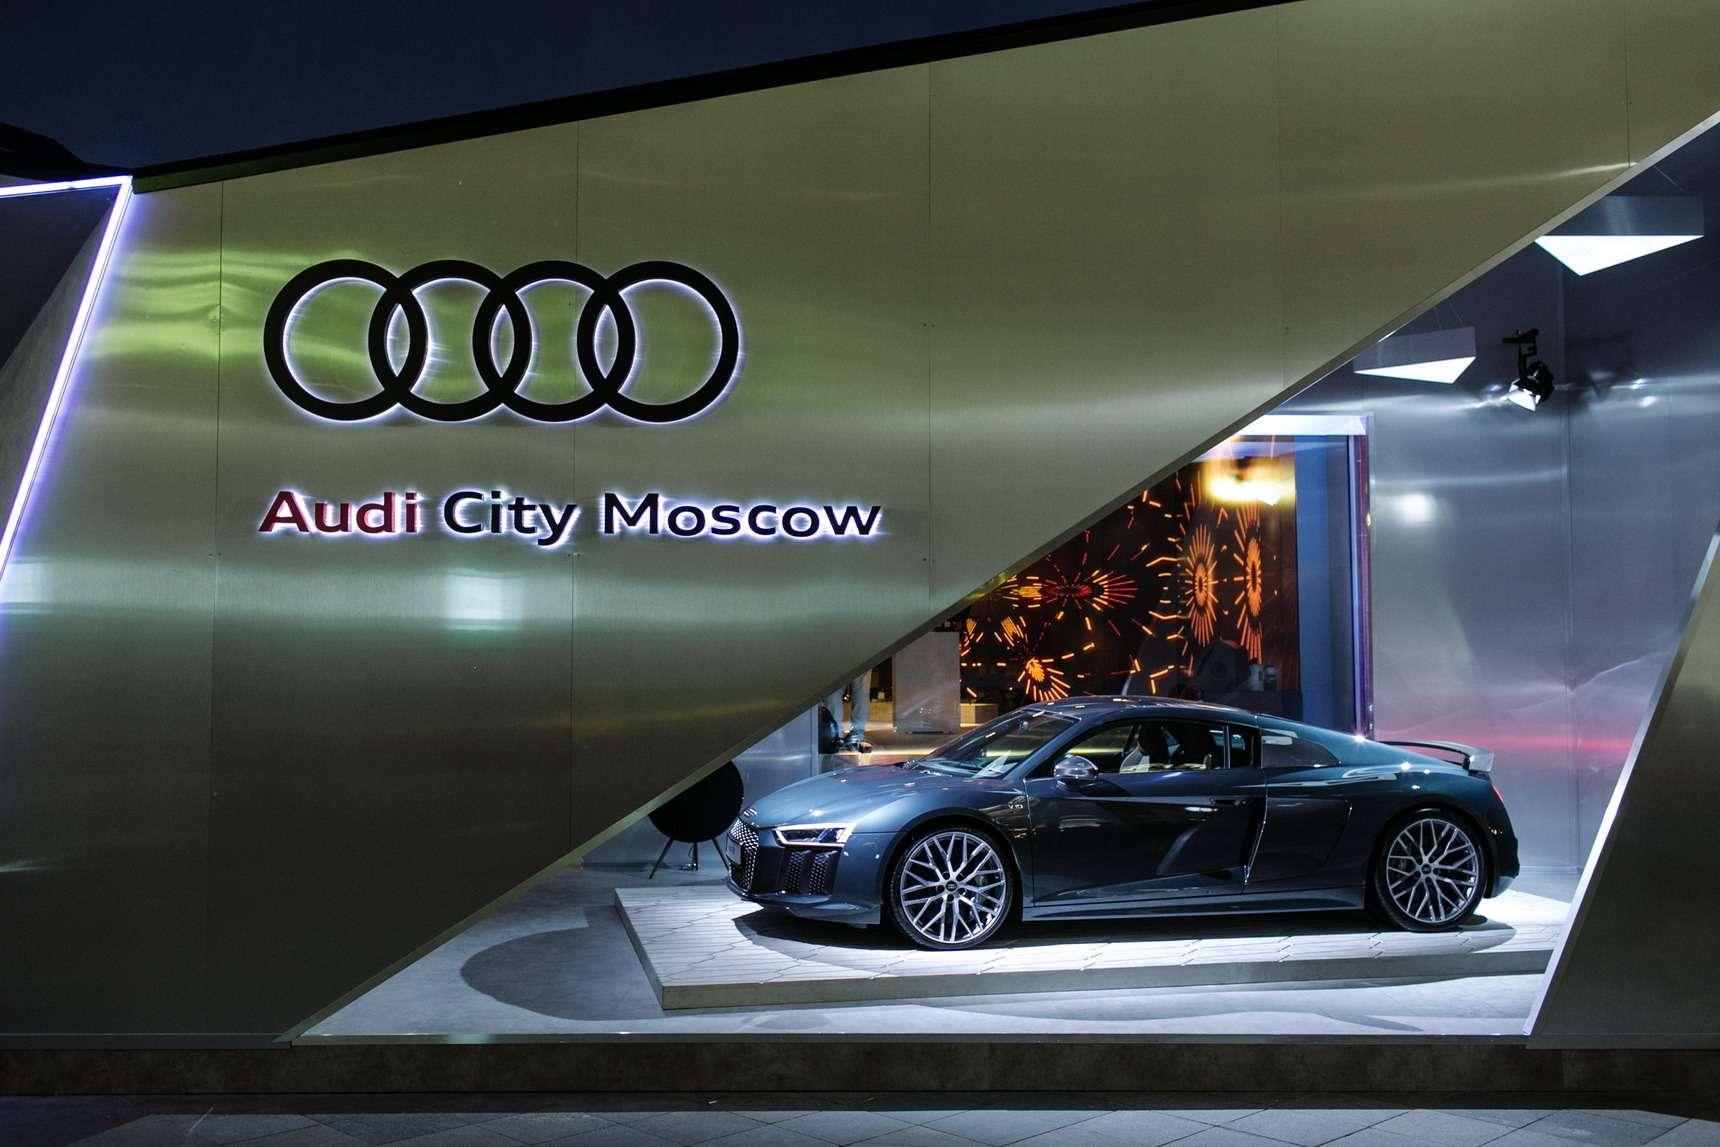 В Москве построили город Audi— фото 603952